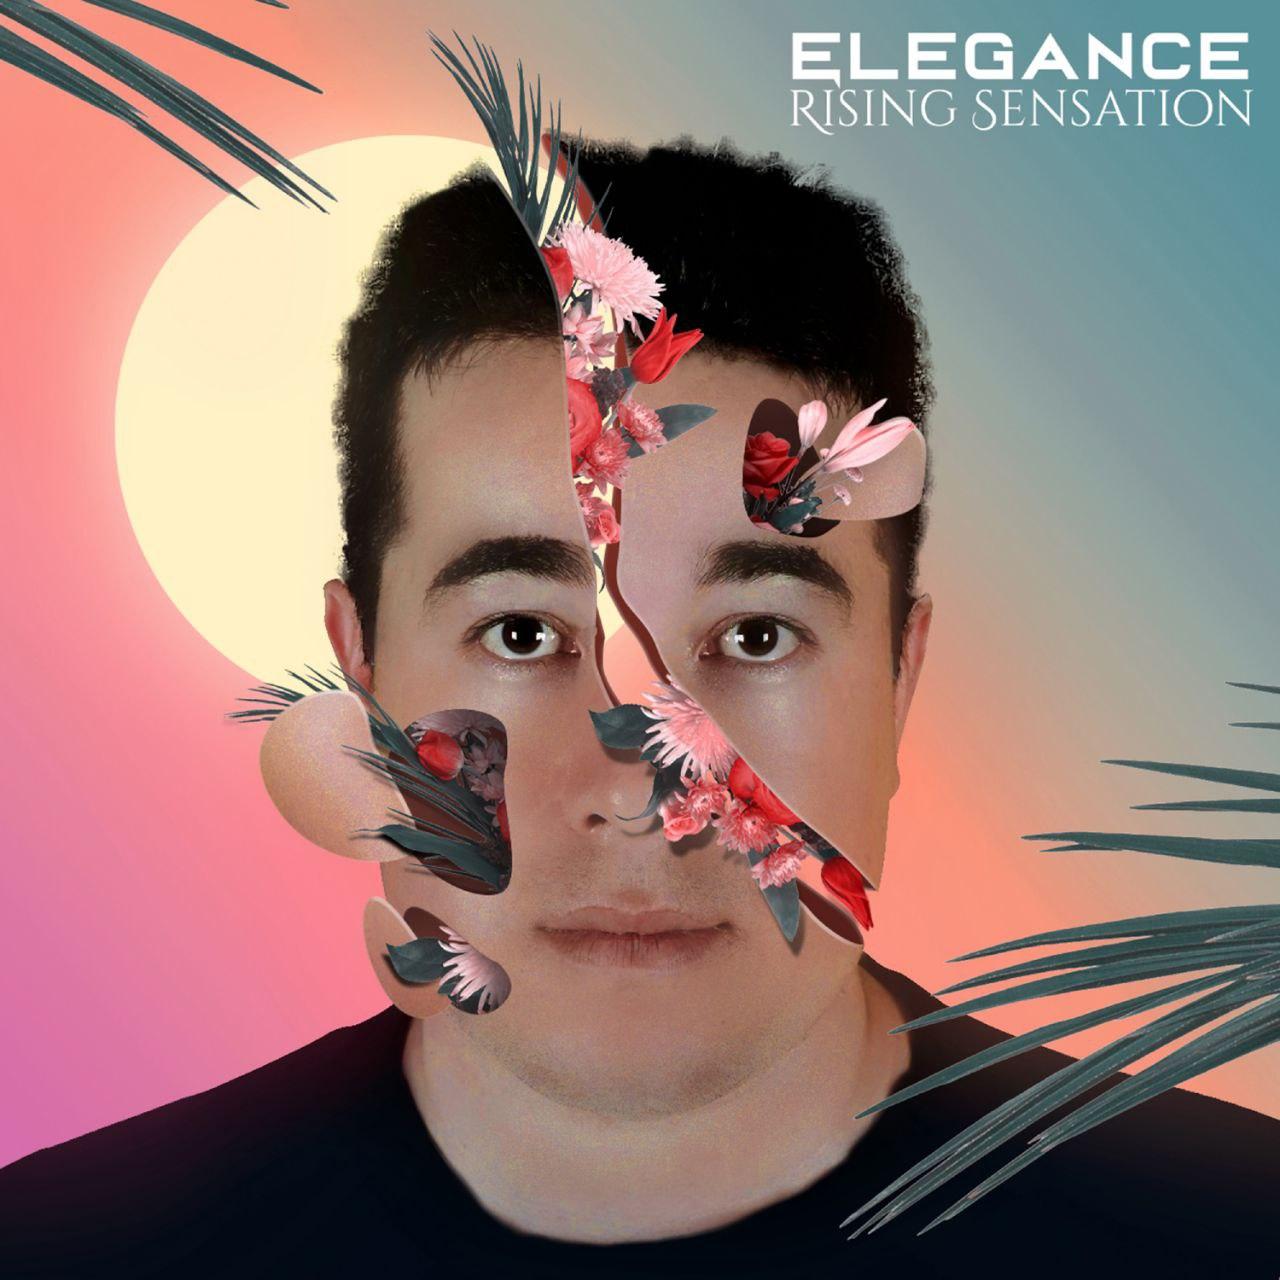 Rising Sensation – Elegance